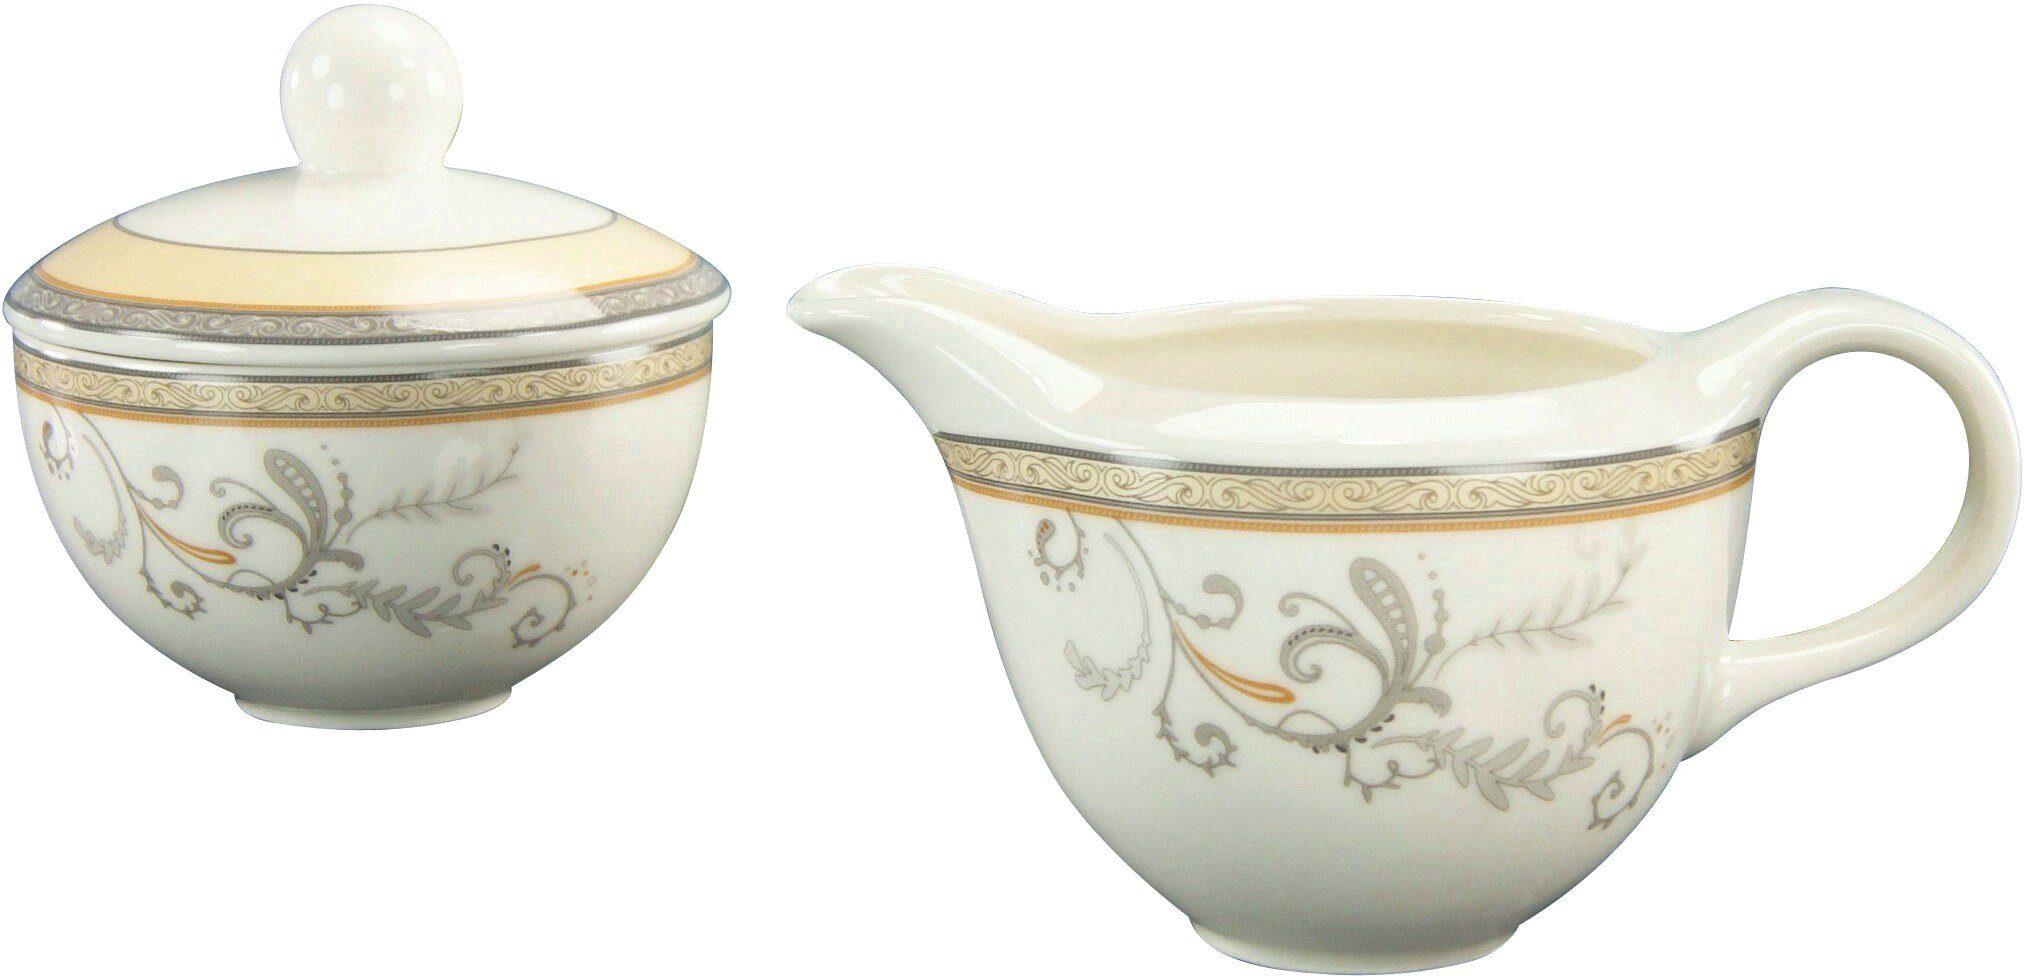 CreaTable Milch/Zucker-Set, Premium-Porzellan, »Villa Medici«